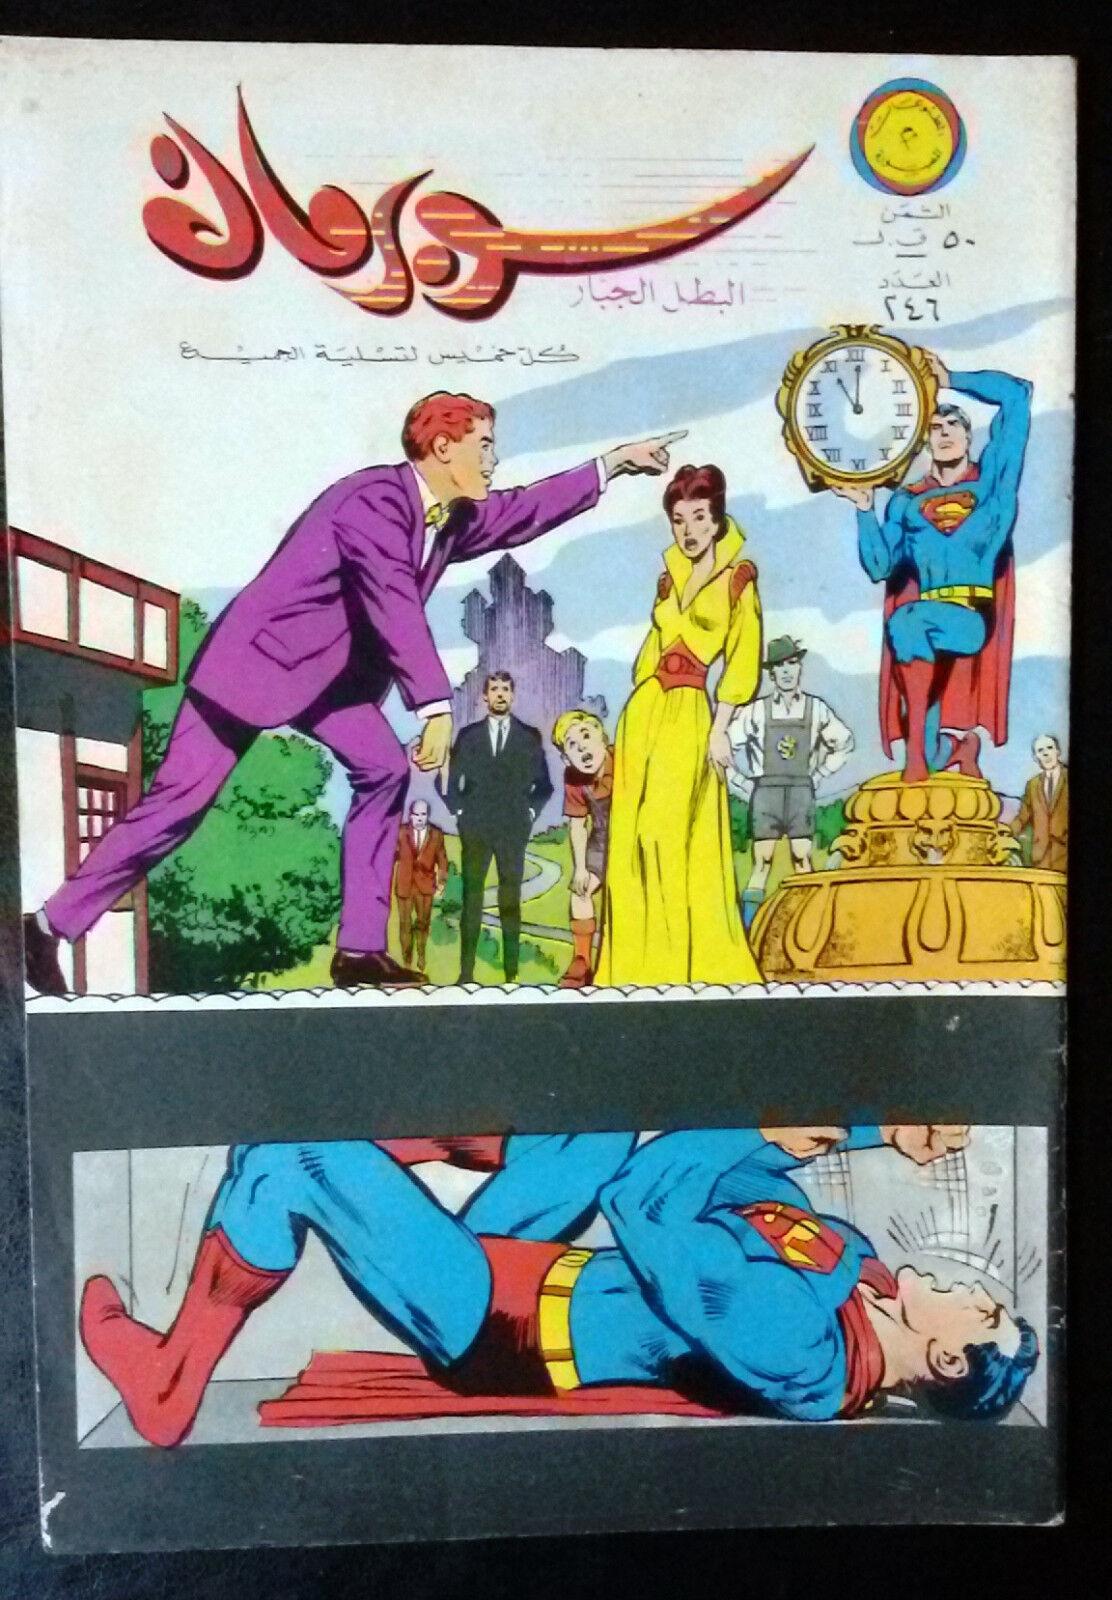 Superman Lebanese Arabic Arabic Arabic Original Rare Comics 1968 No.246 سوبرمان كومكس 13c8fd